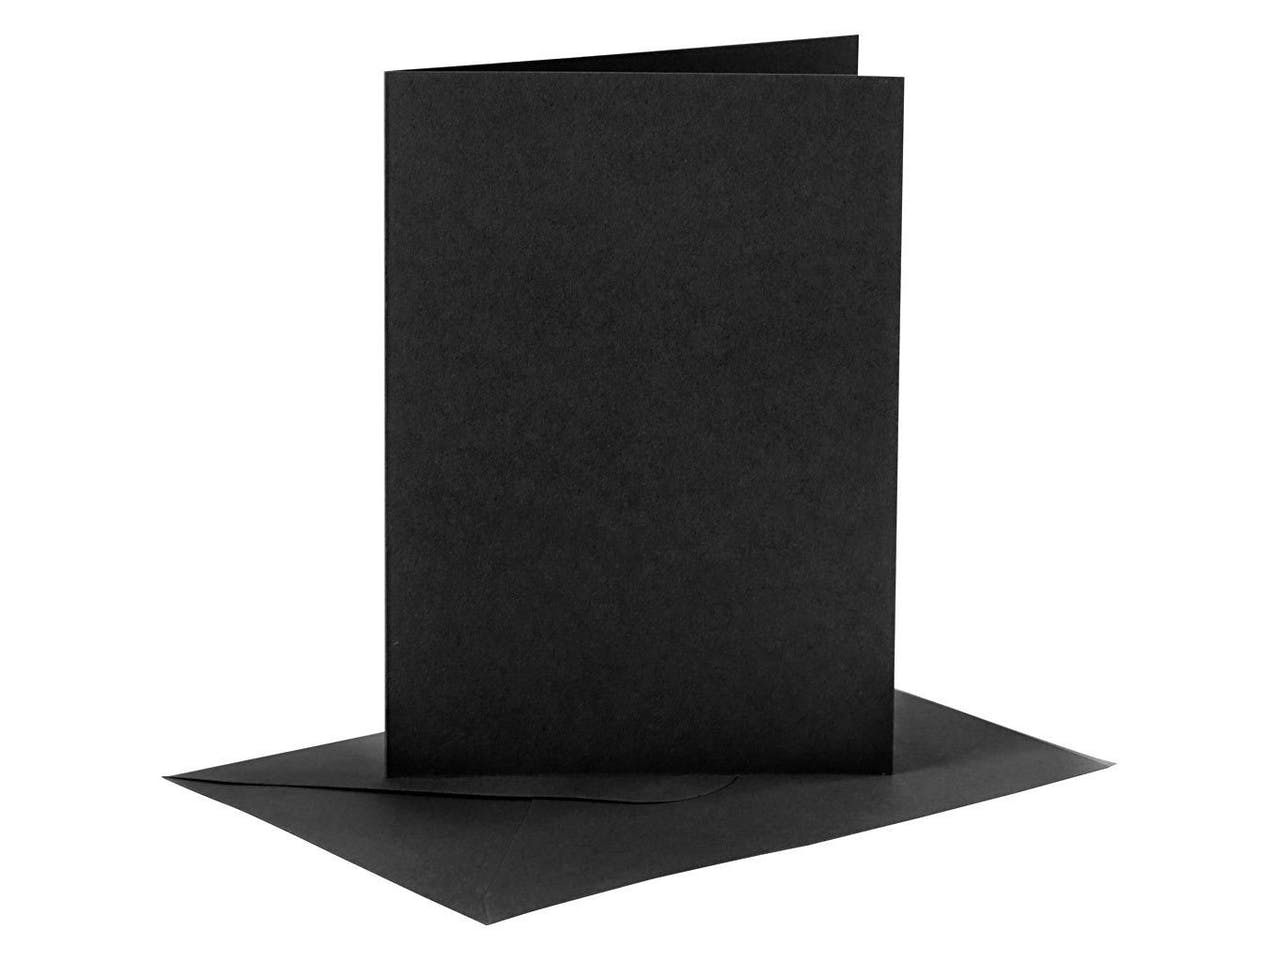 Blankokarten-Set, je 6 Klappkarten A6 & Kuverts C6, schwarz